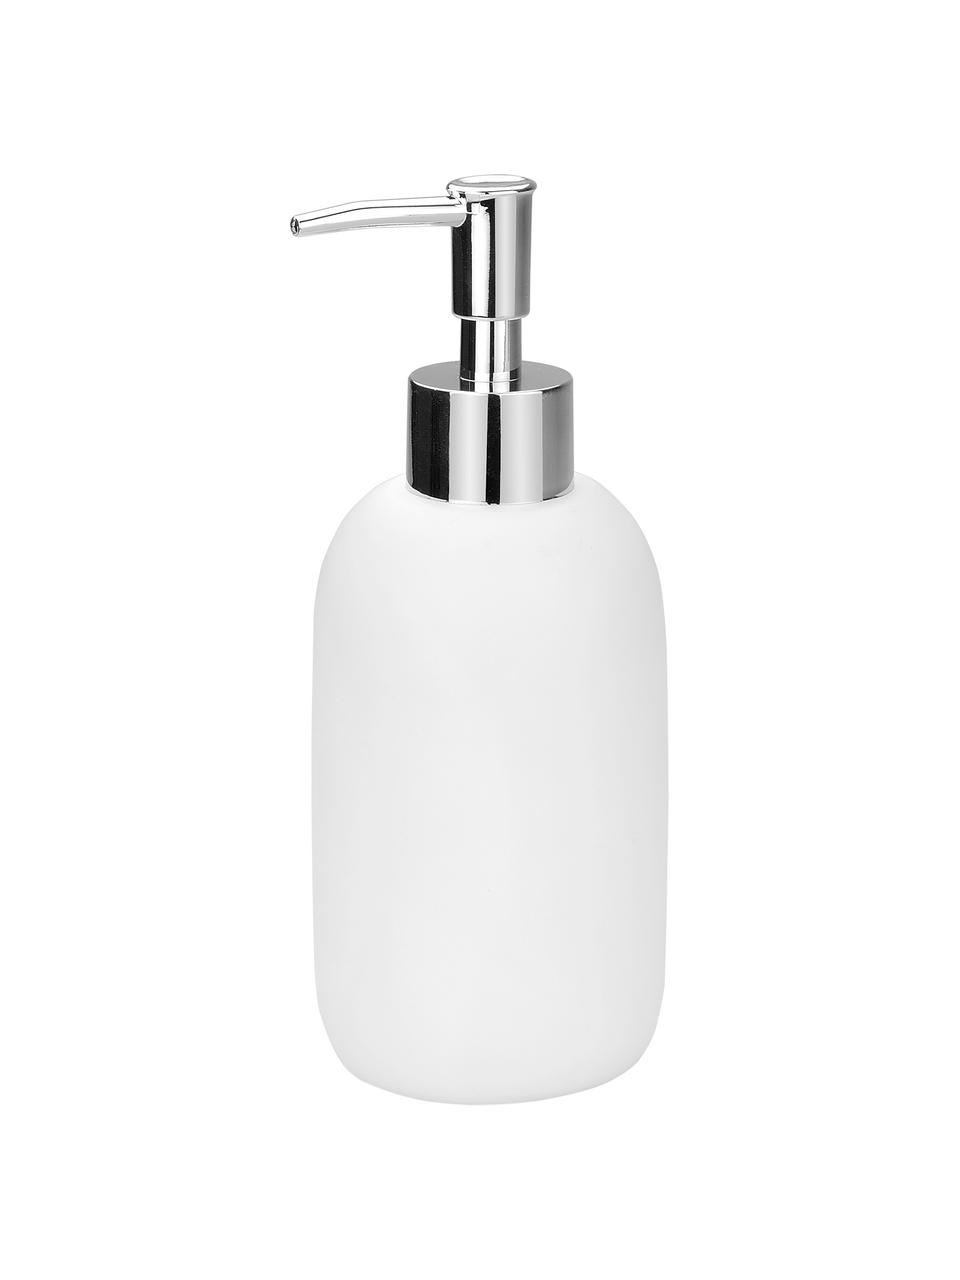 Seifenspender Angel, Behälter: Keramik, Pumpkopf: Kunststoff, Weiß, Ø 7 x H 19 cm